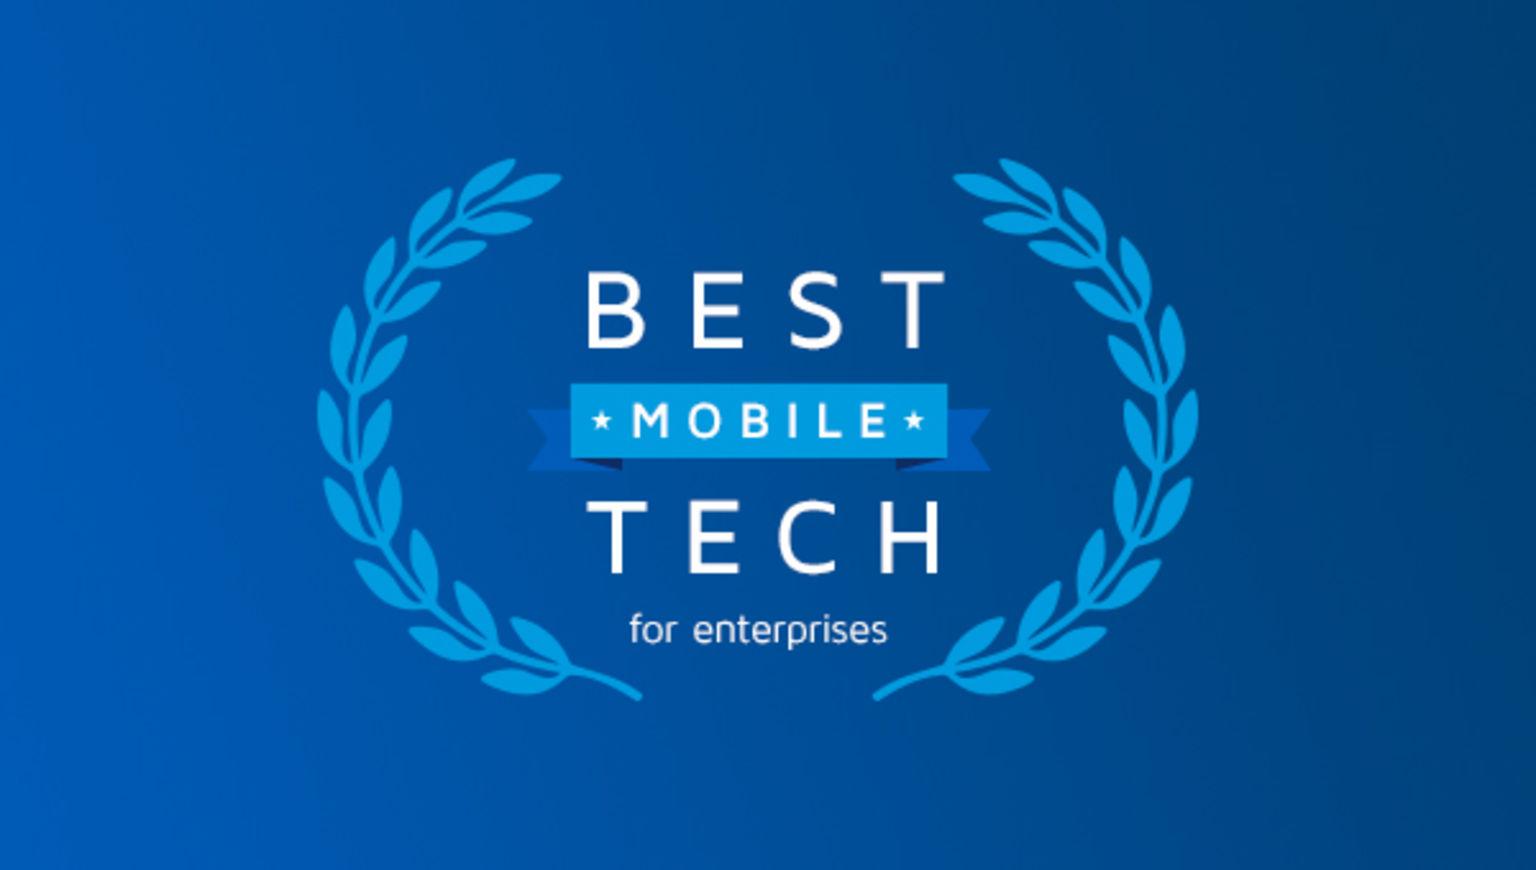 DocuSign wins tech award for mobile app